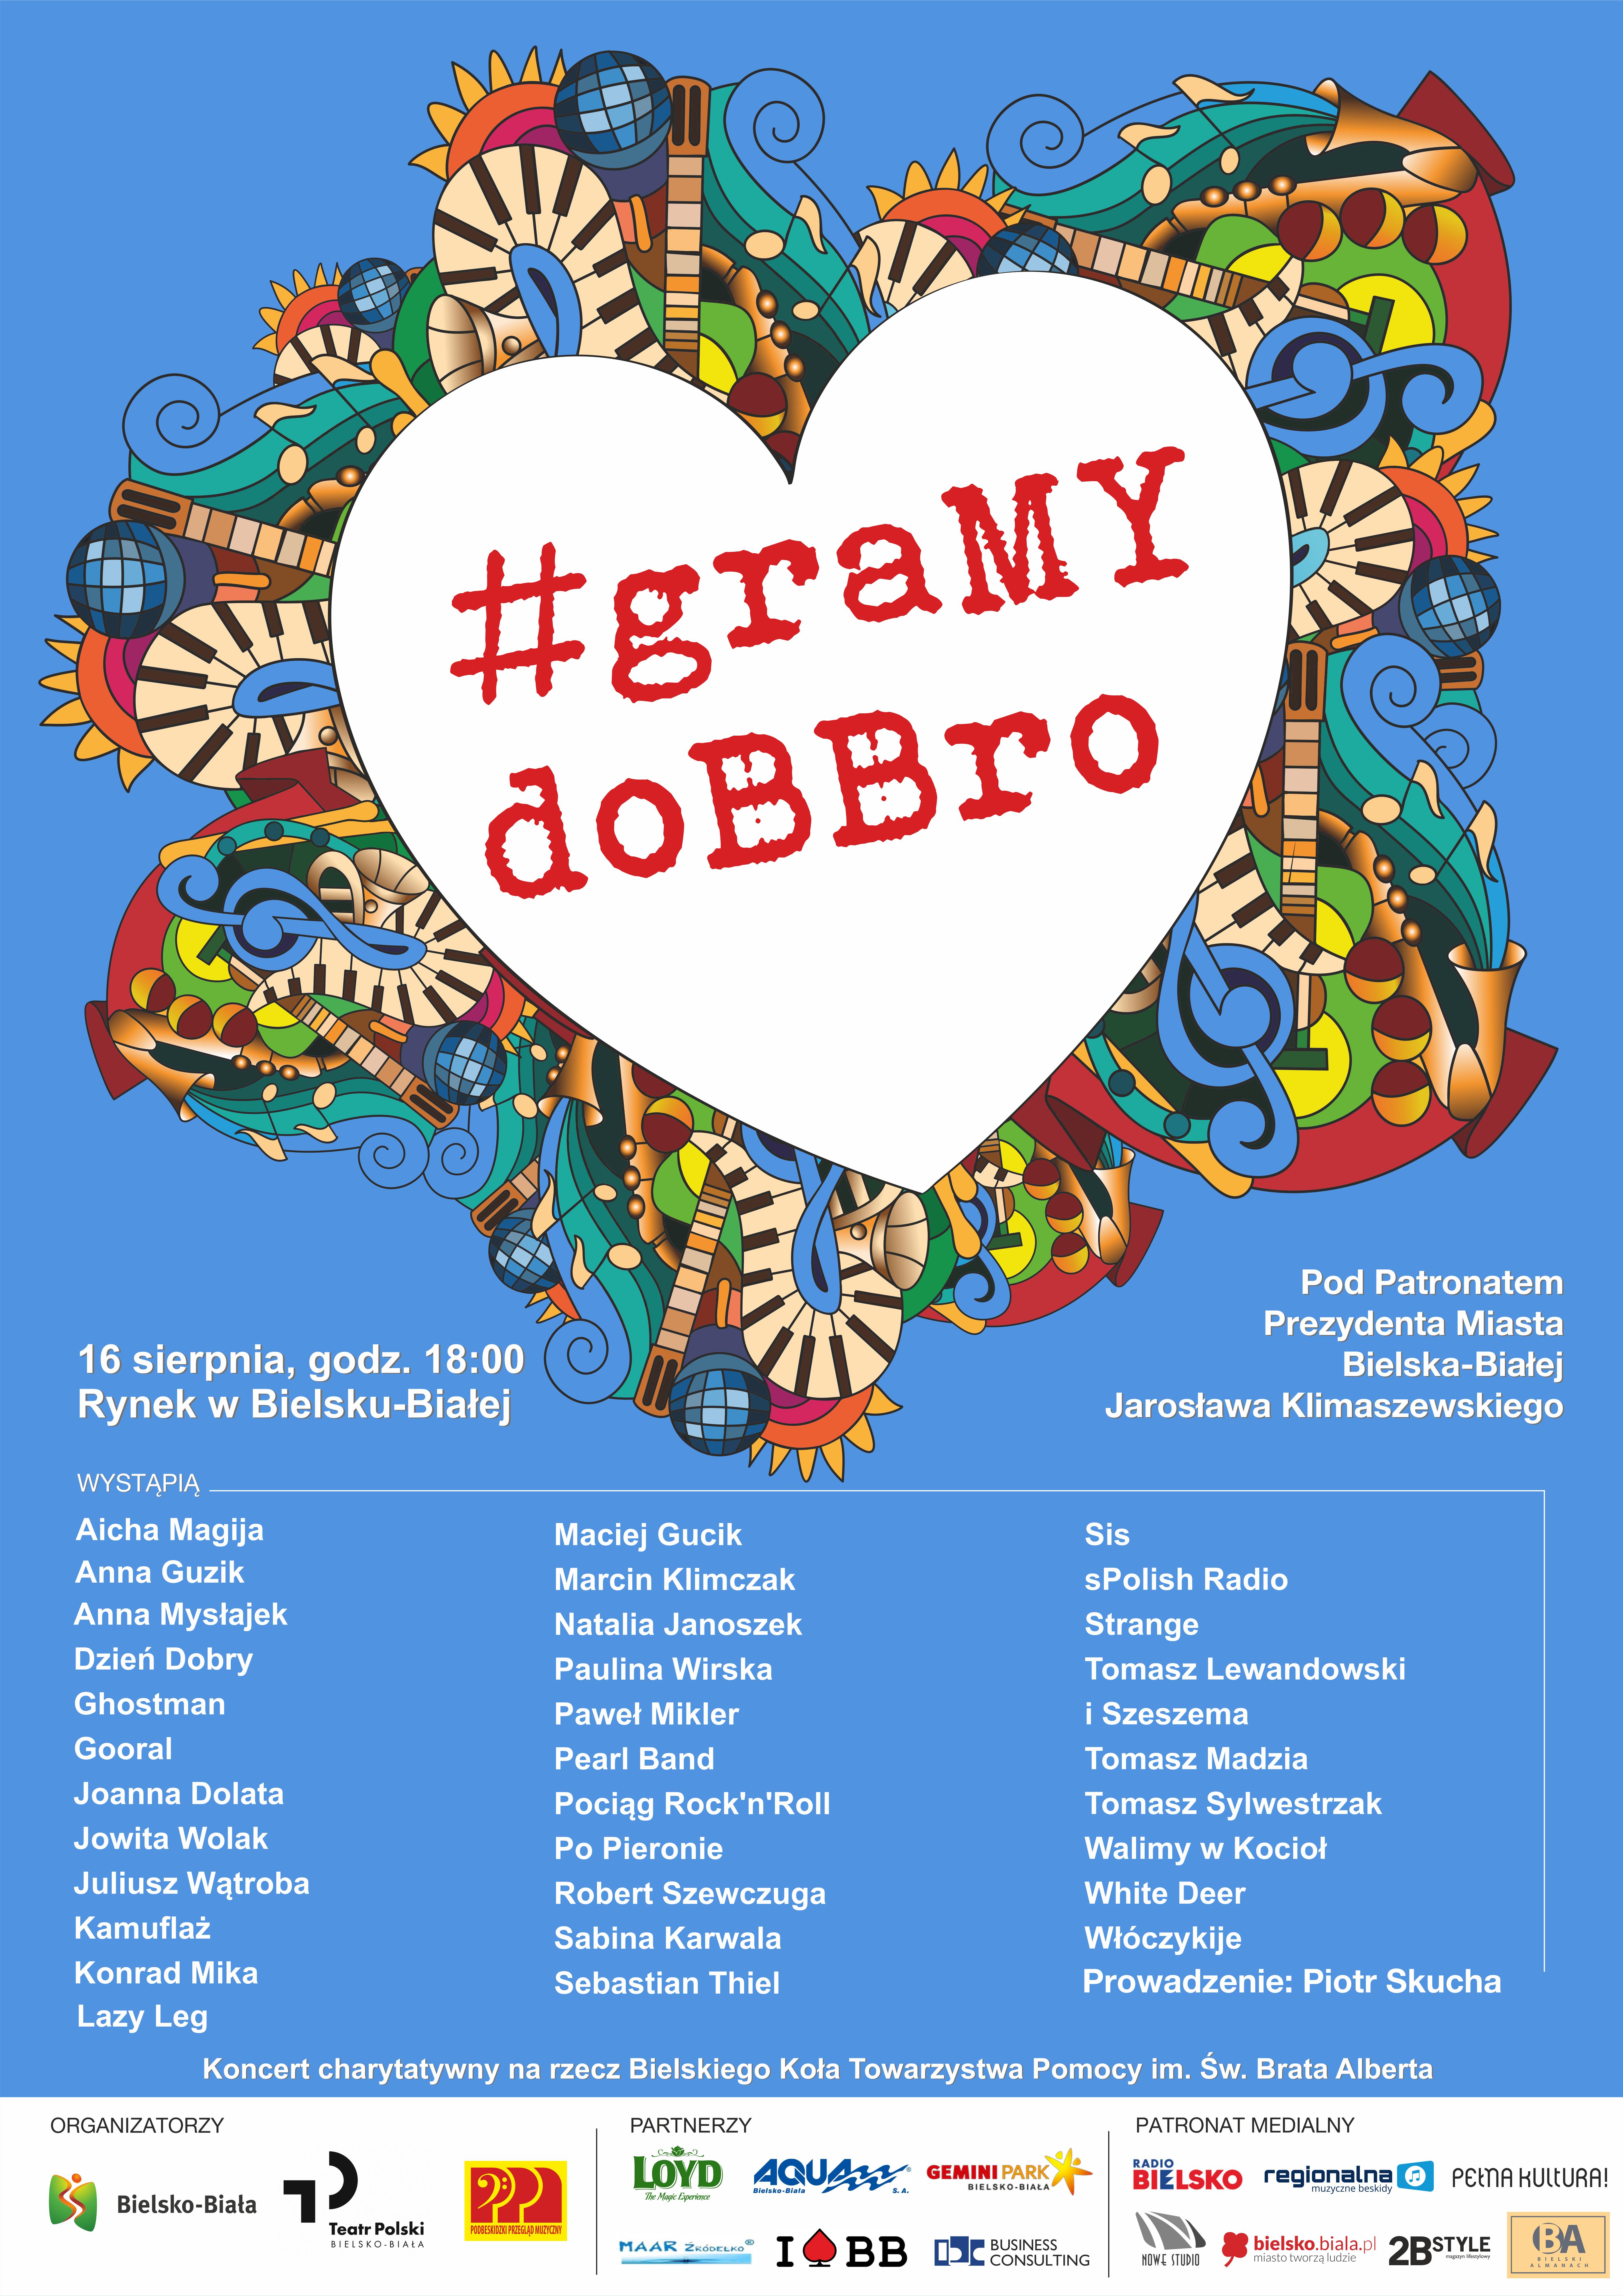 #gramy Dobbro